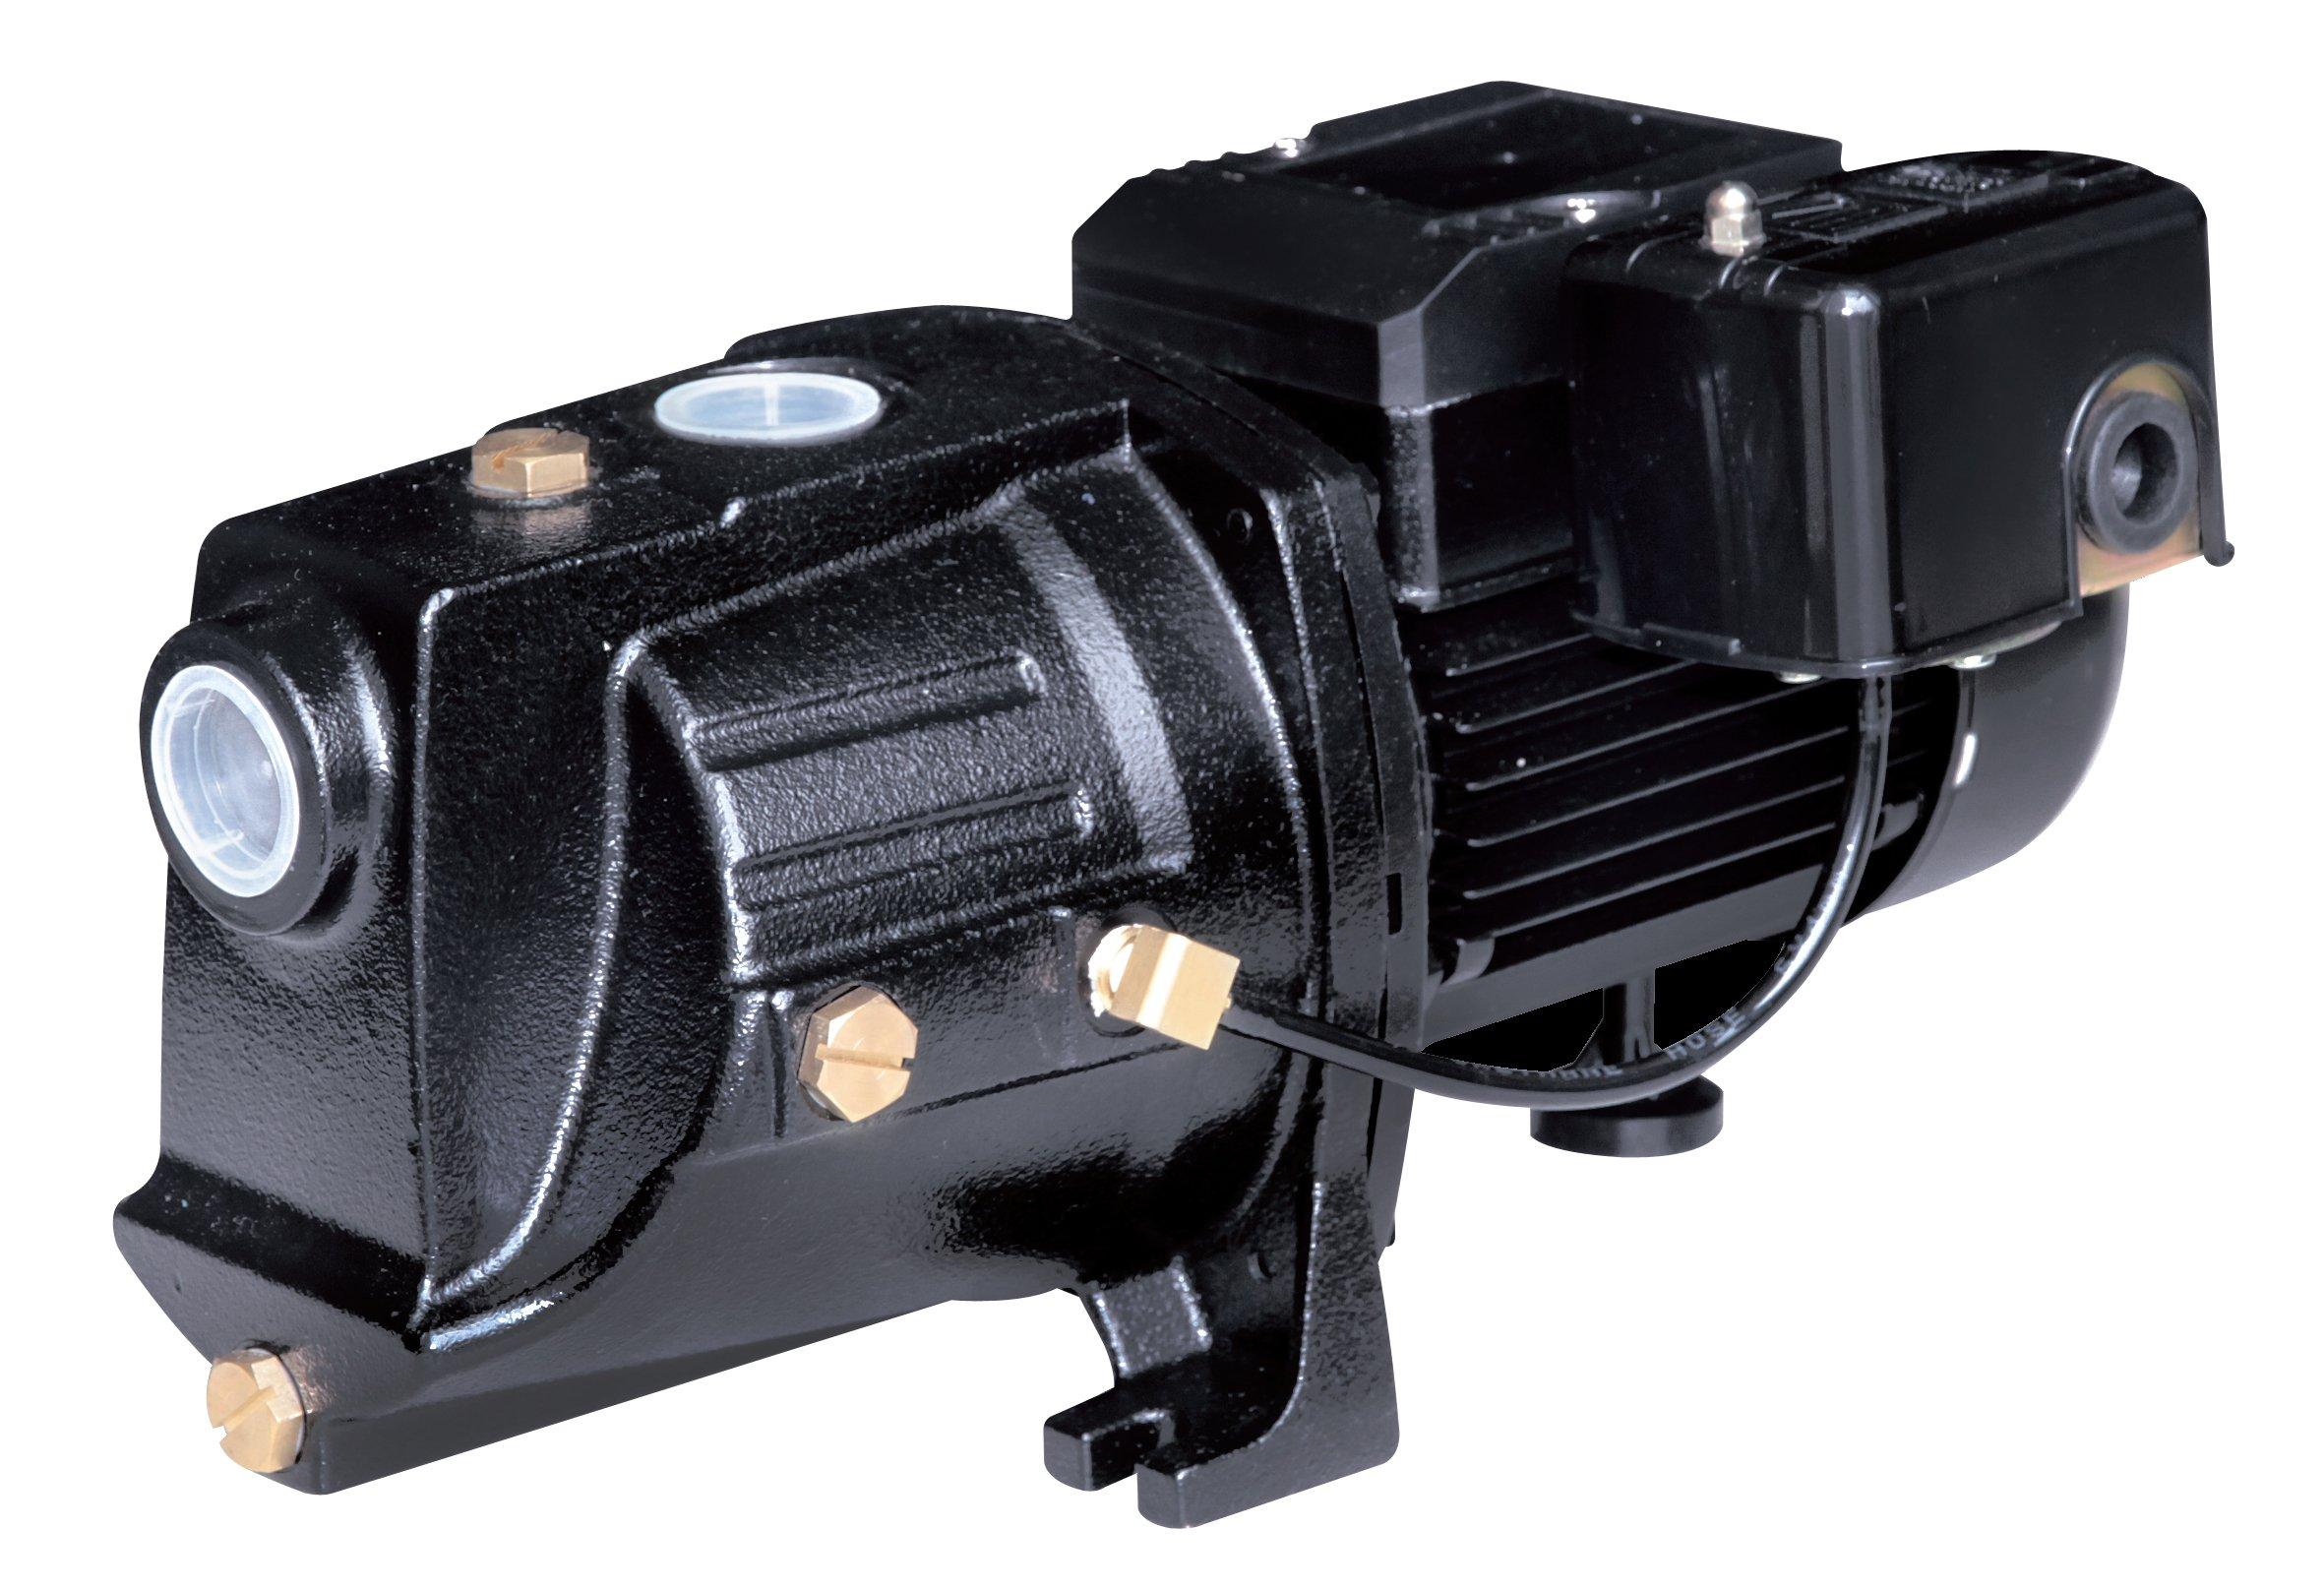 Acquaer SJC075 3/4 HP Dual-Voltage Cast Iron Shallow Well Jet Pump, Black by Acquaer